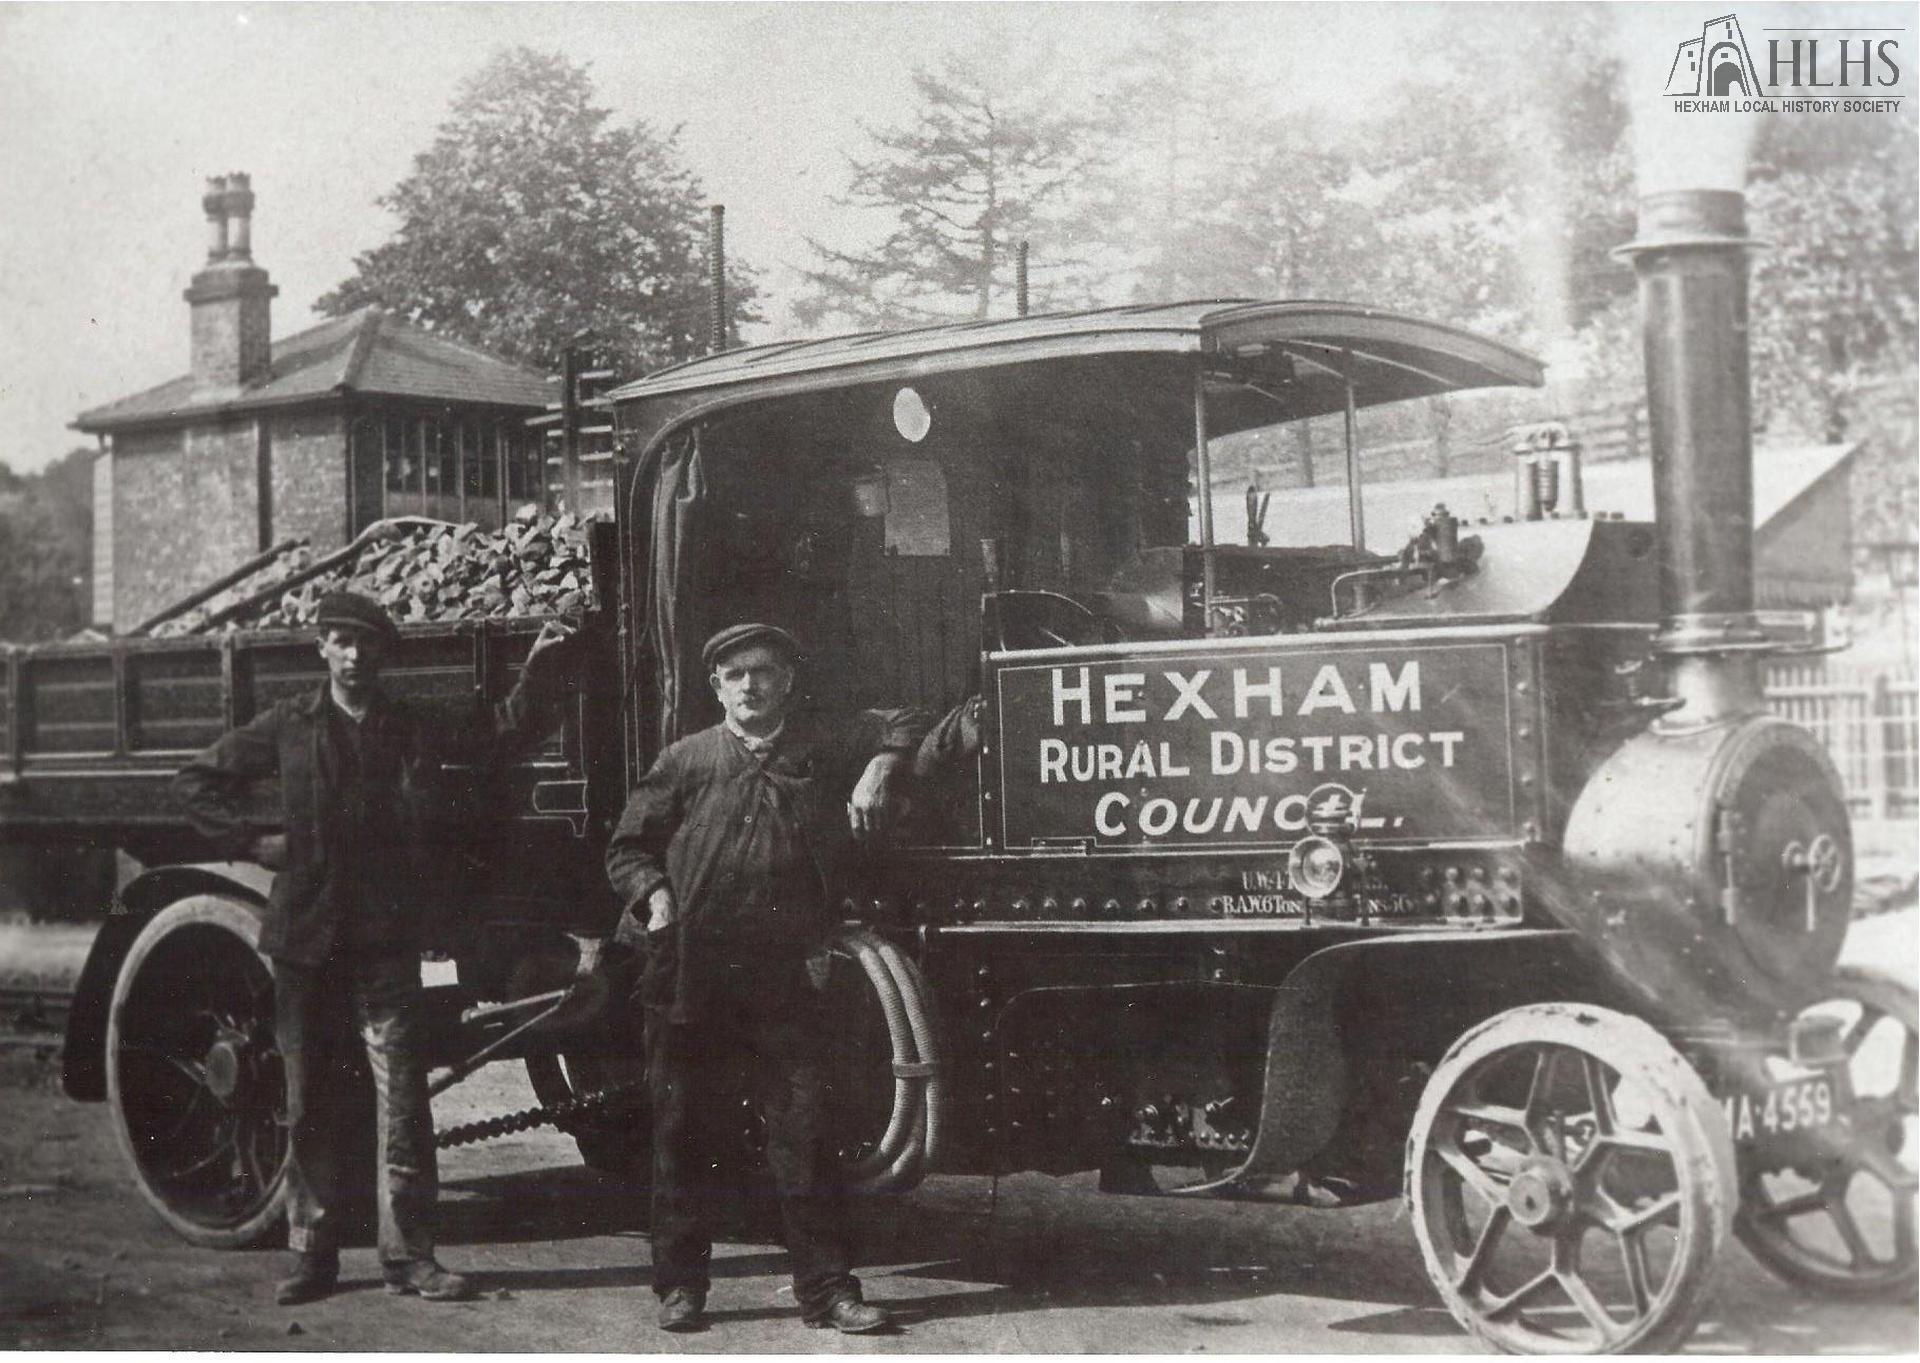 1920s: Hexham RDC steam lorry, with two workmen